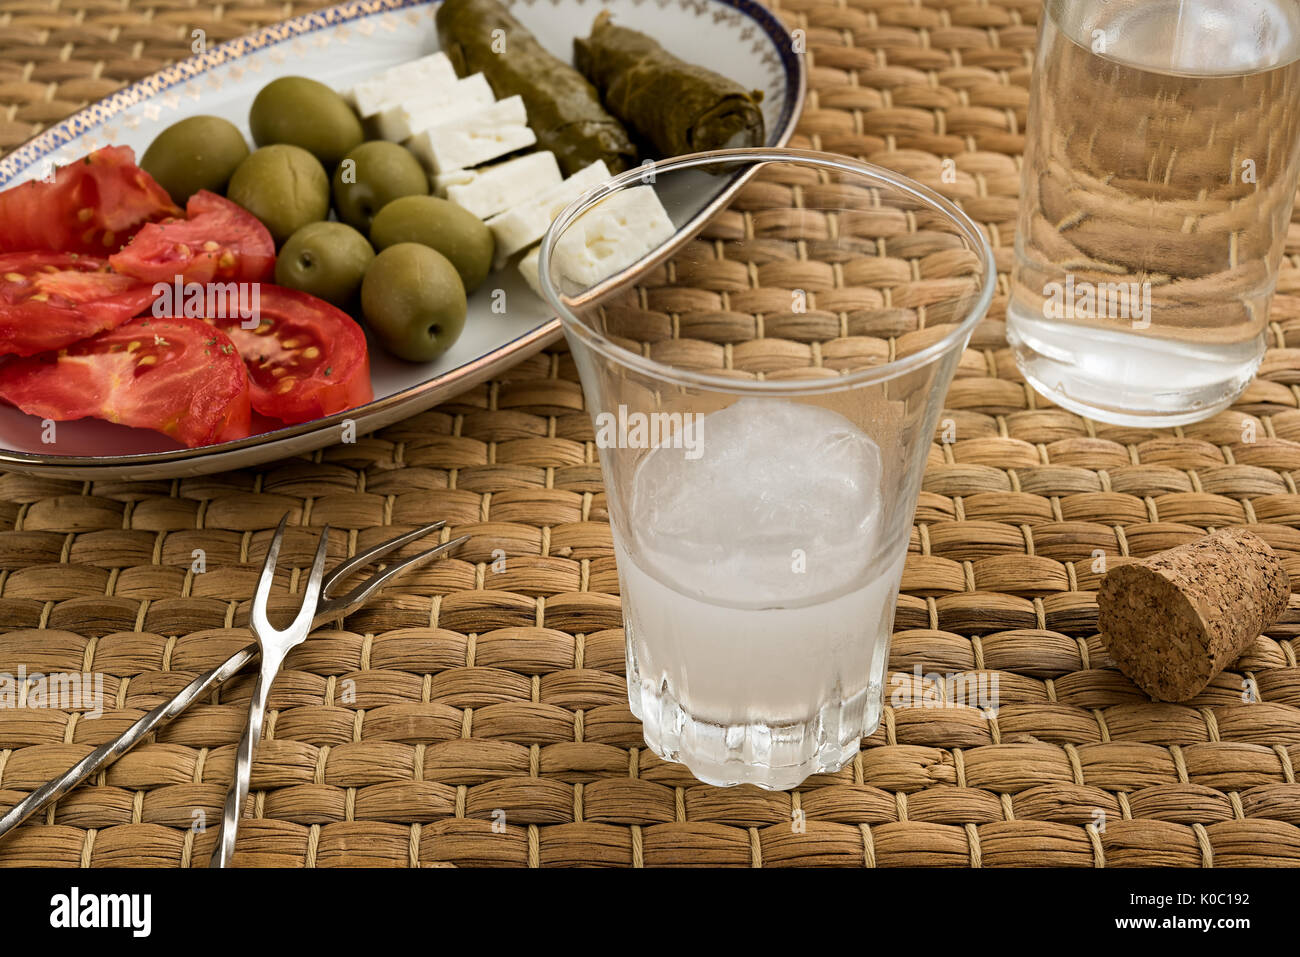 how to drink turkish raki